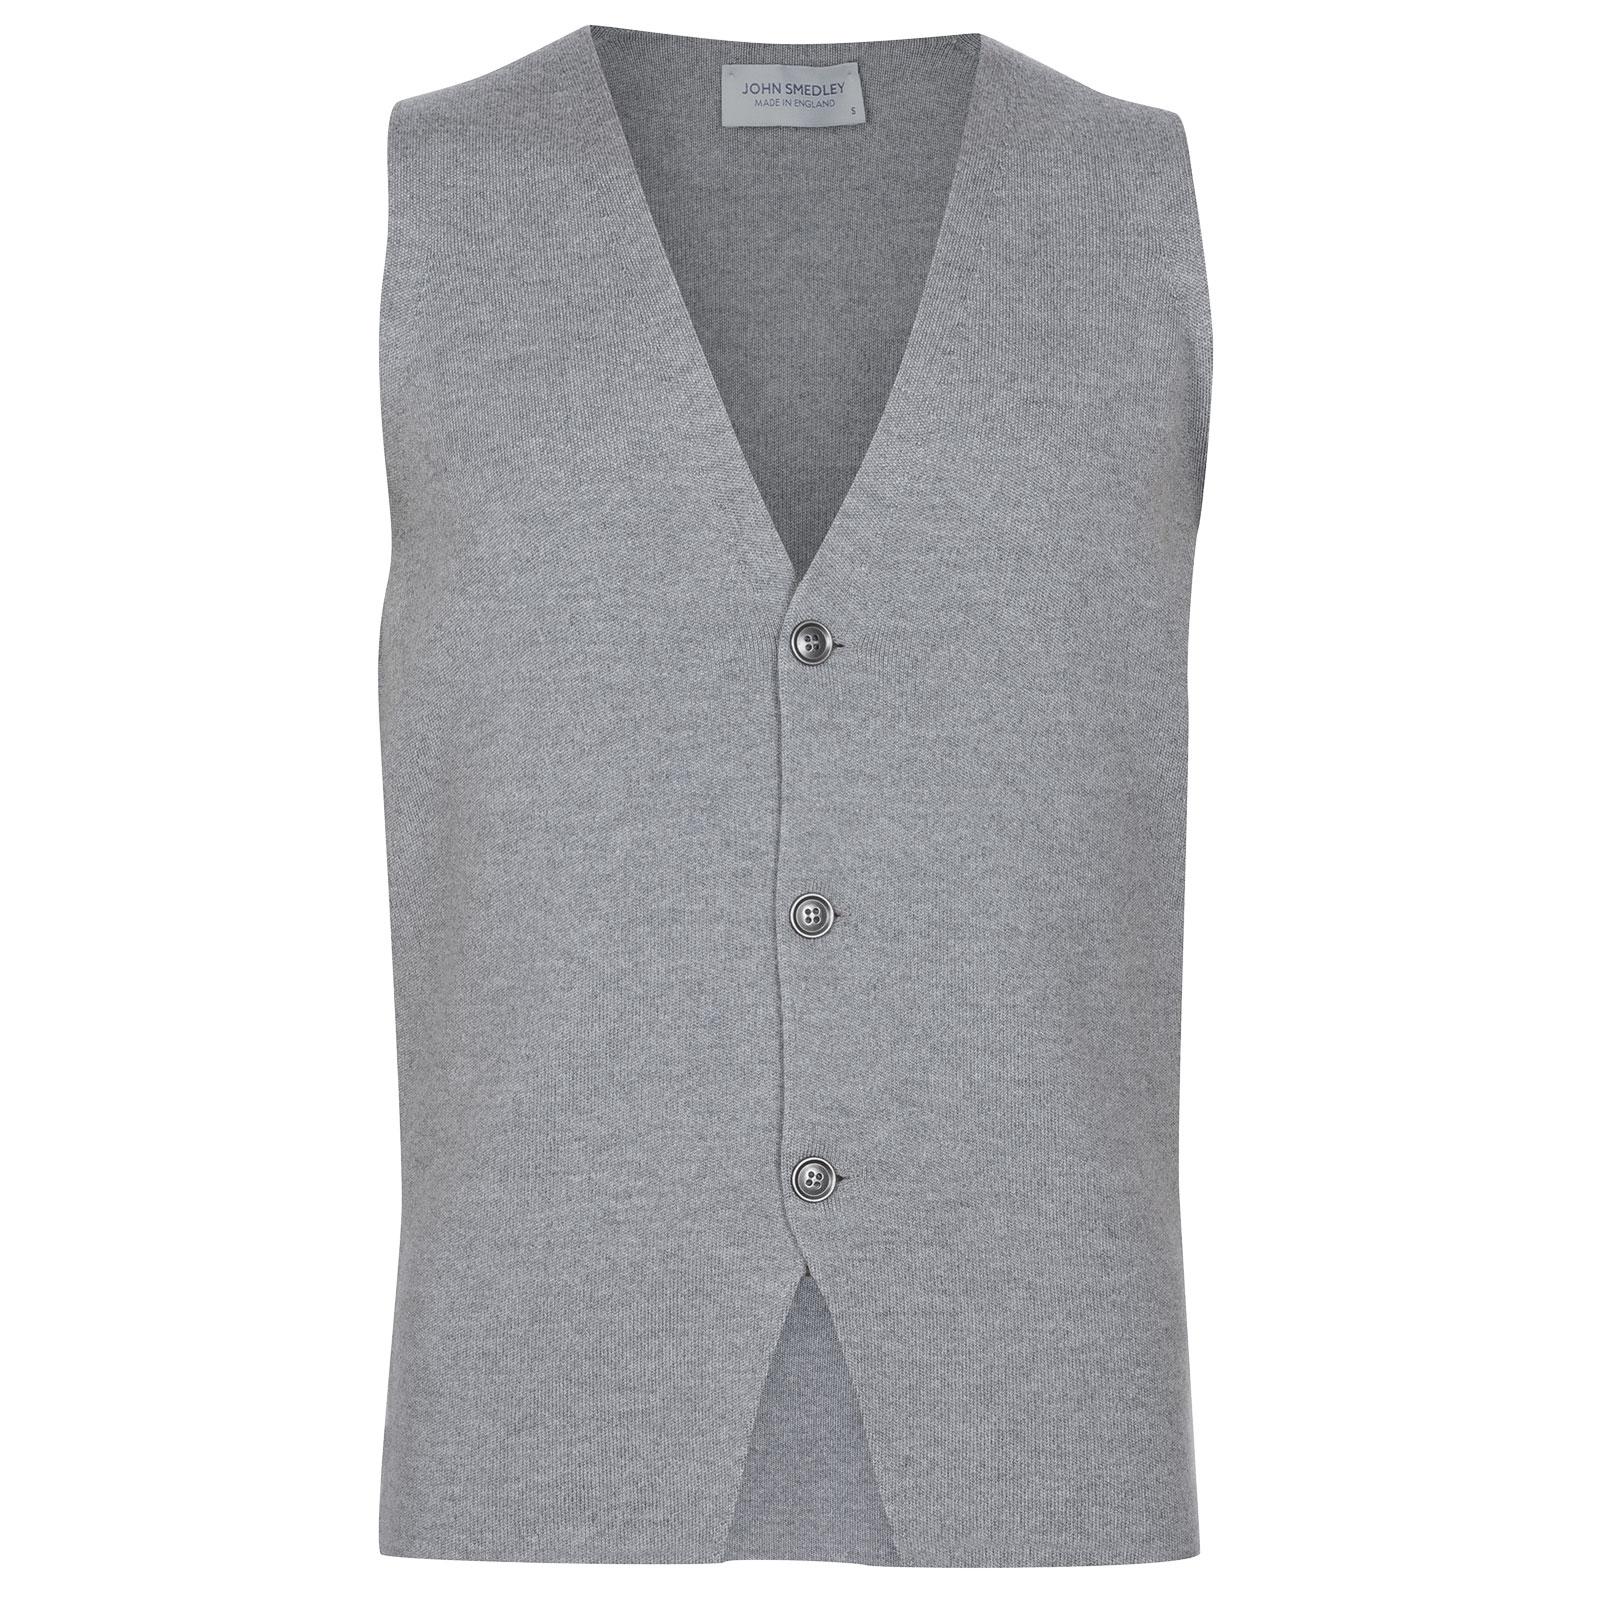 John Smedley Telford Merino Wool Waistcoat in Silver-L